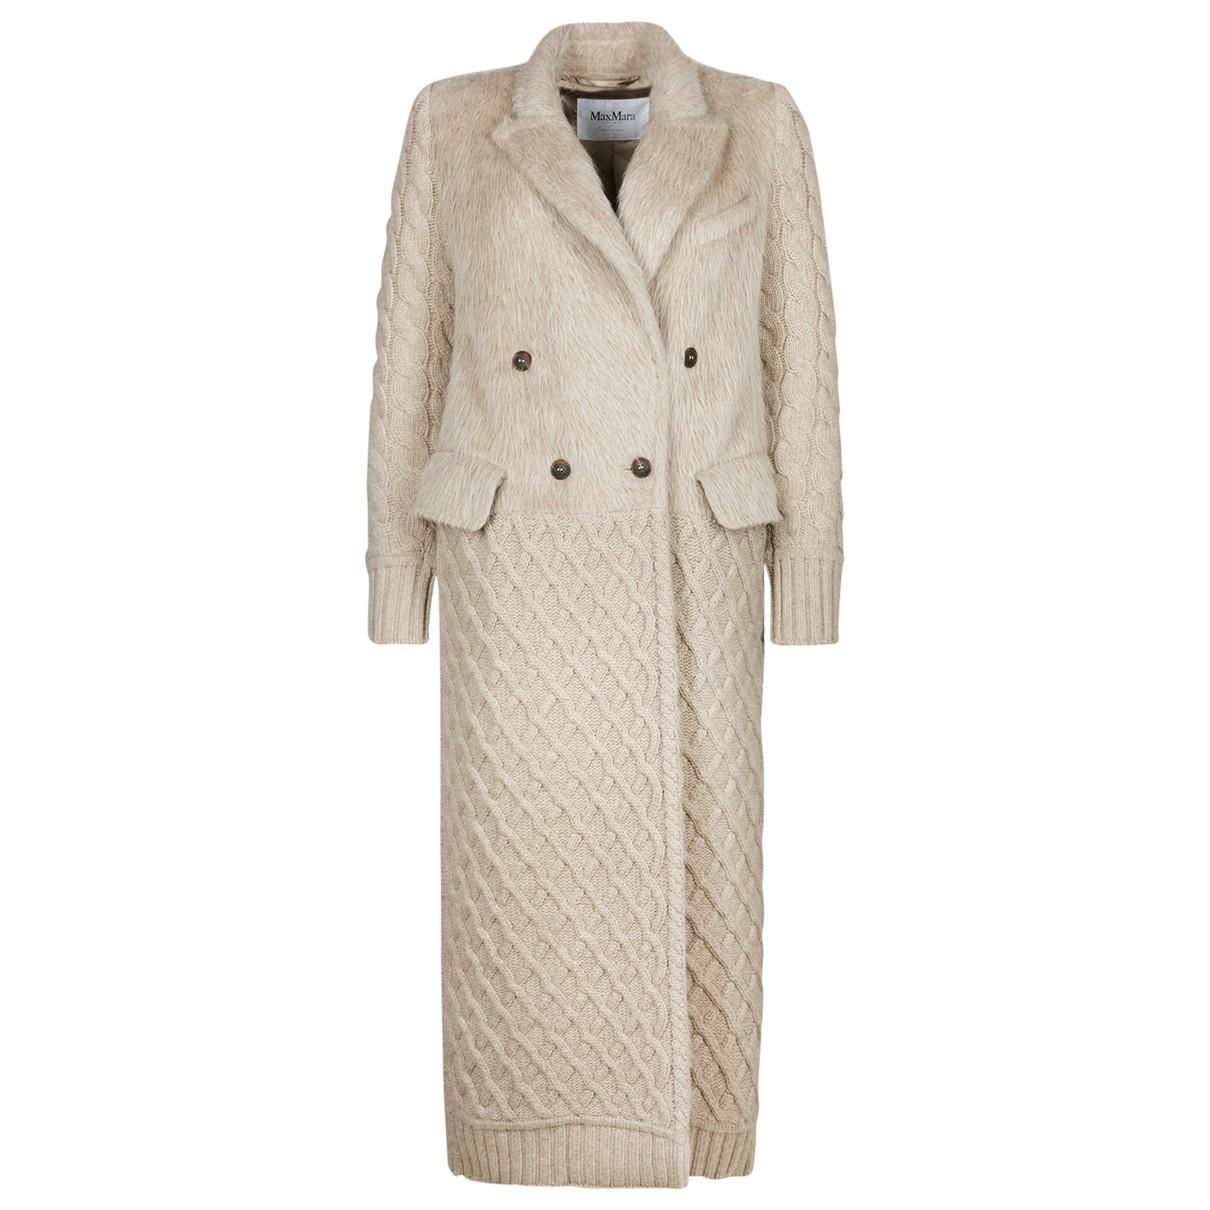 Max Mara \N Beige Wool coat for Women 8 UK